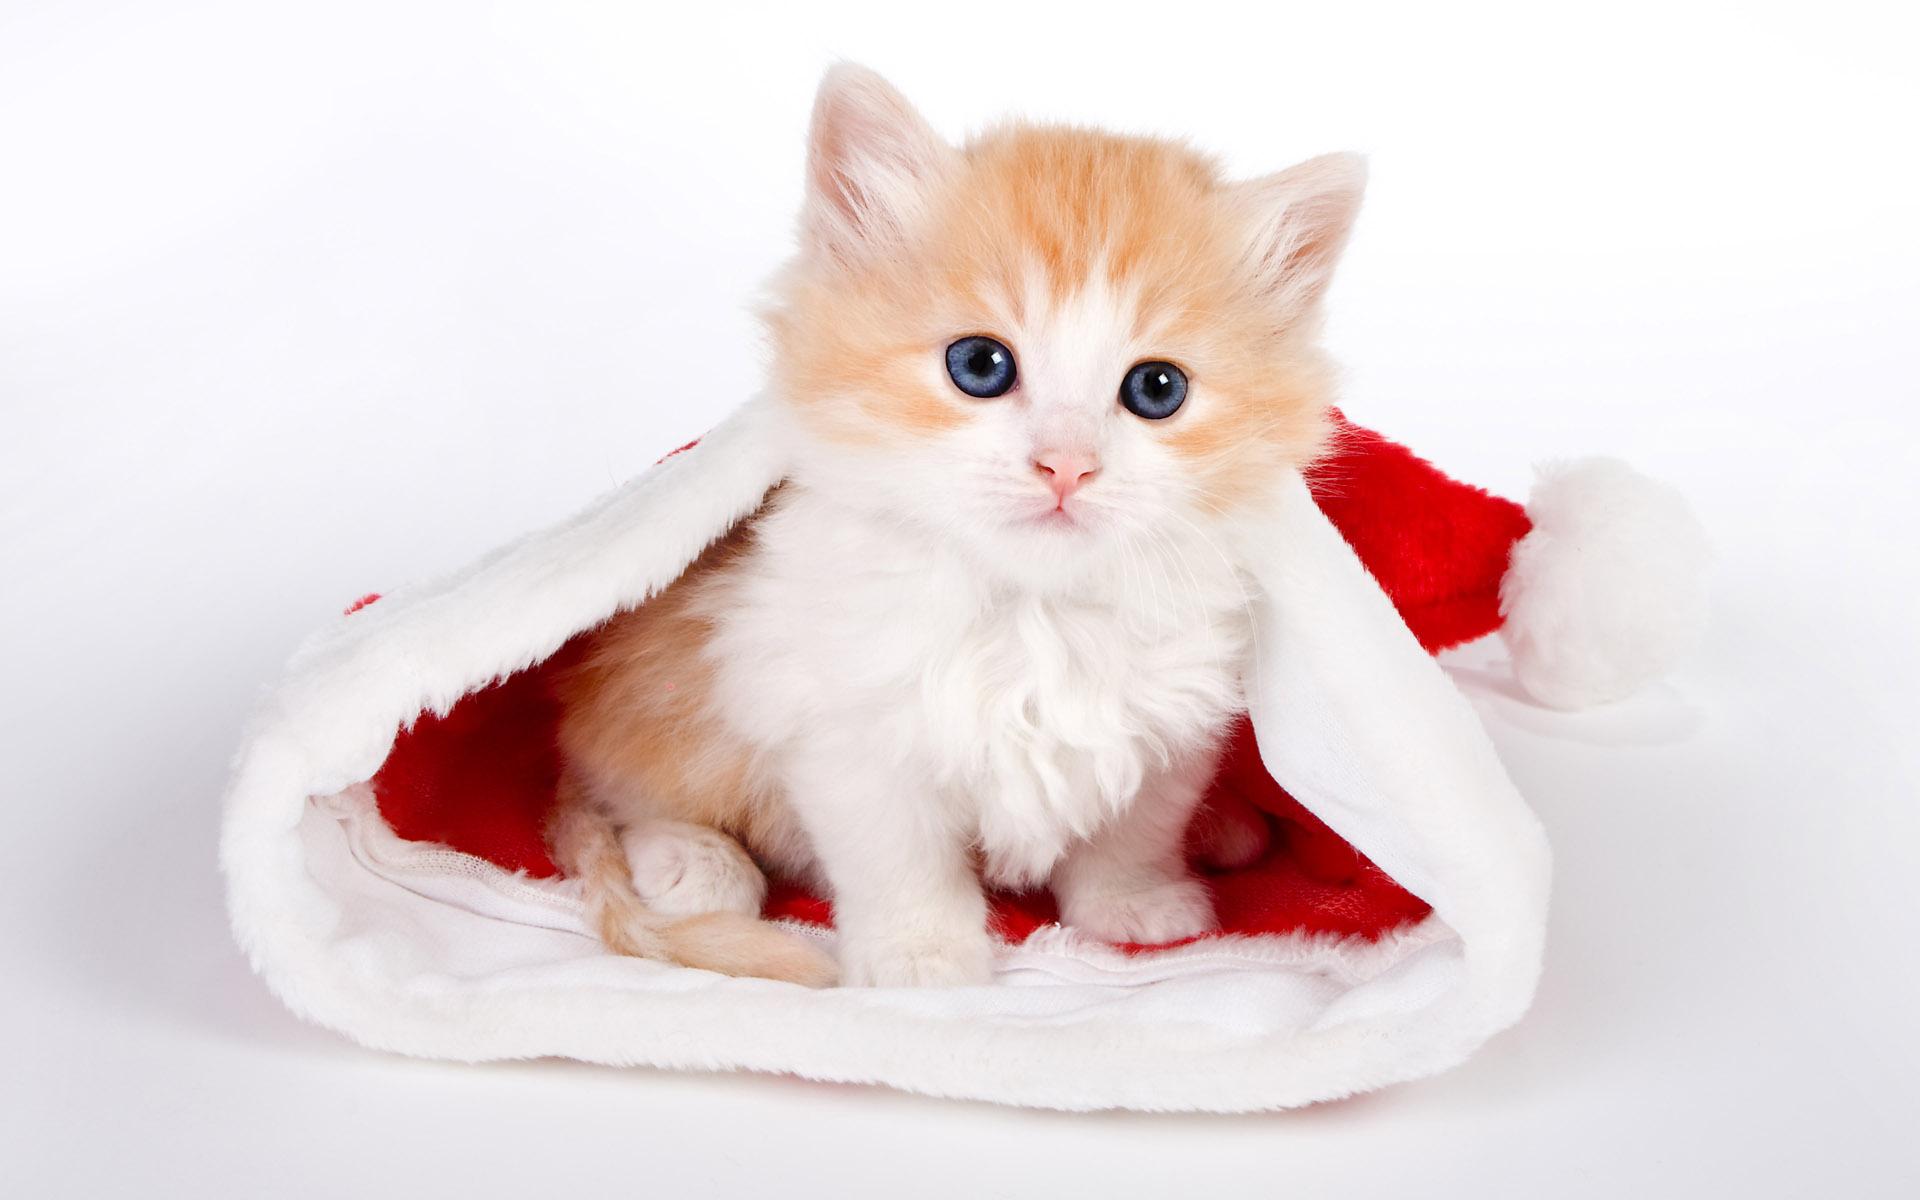 Cute Santa Hat Wallpaper 41716 1920x1200 px